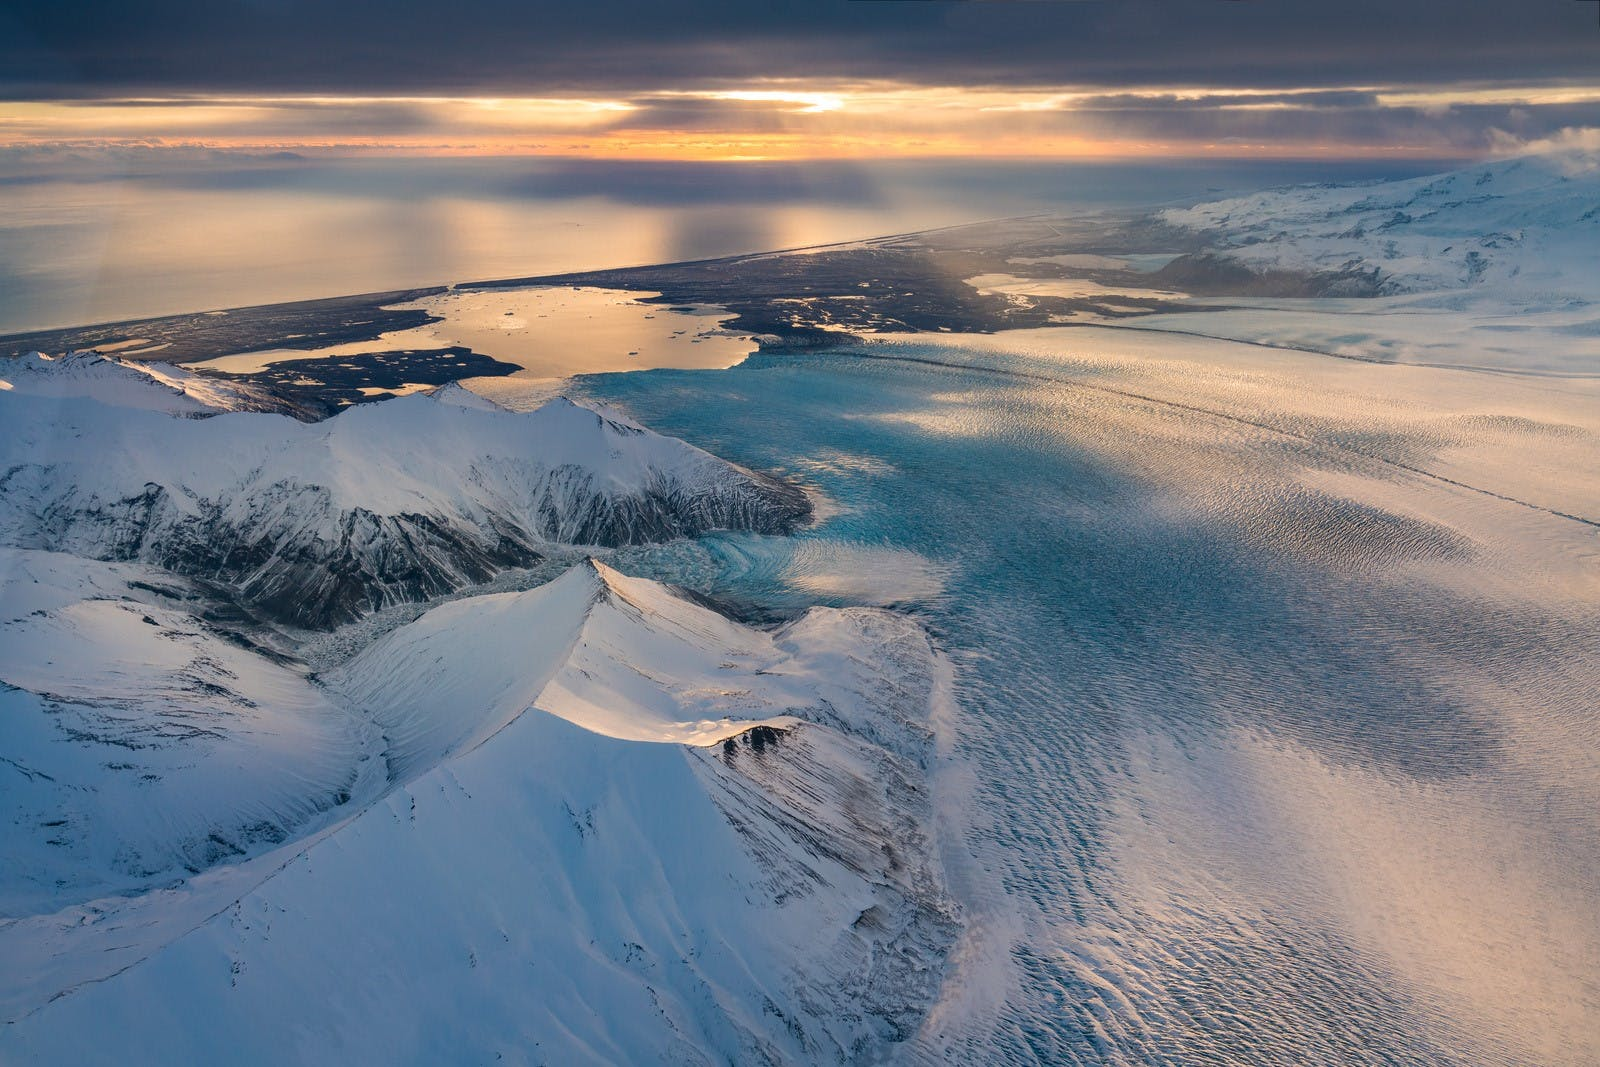 Aerial photo of Vatnajokull glacier